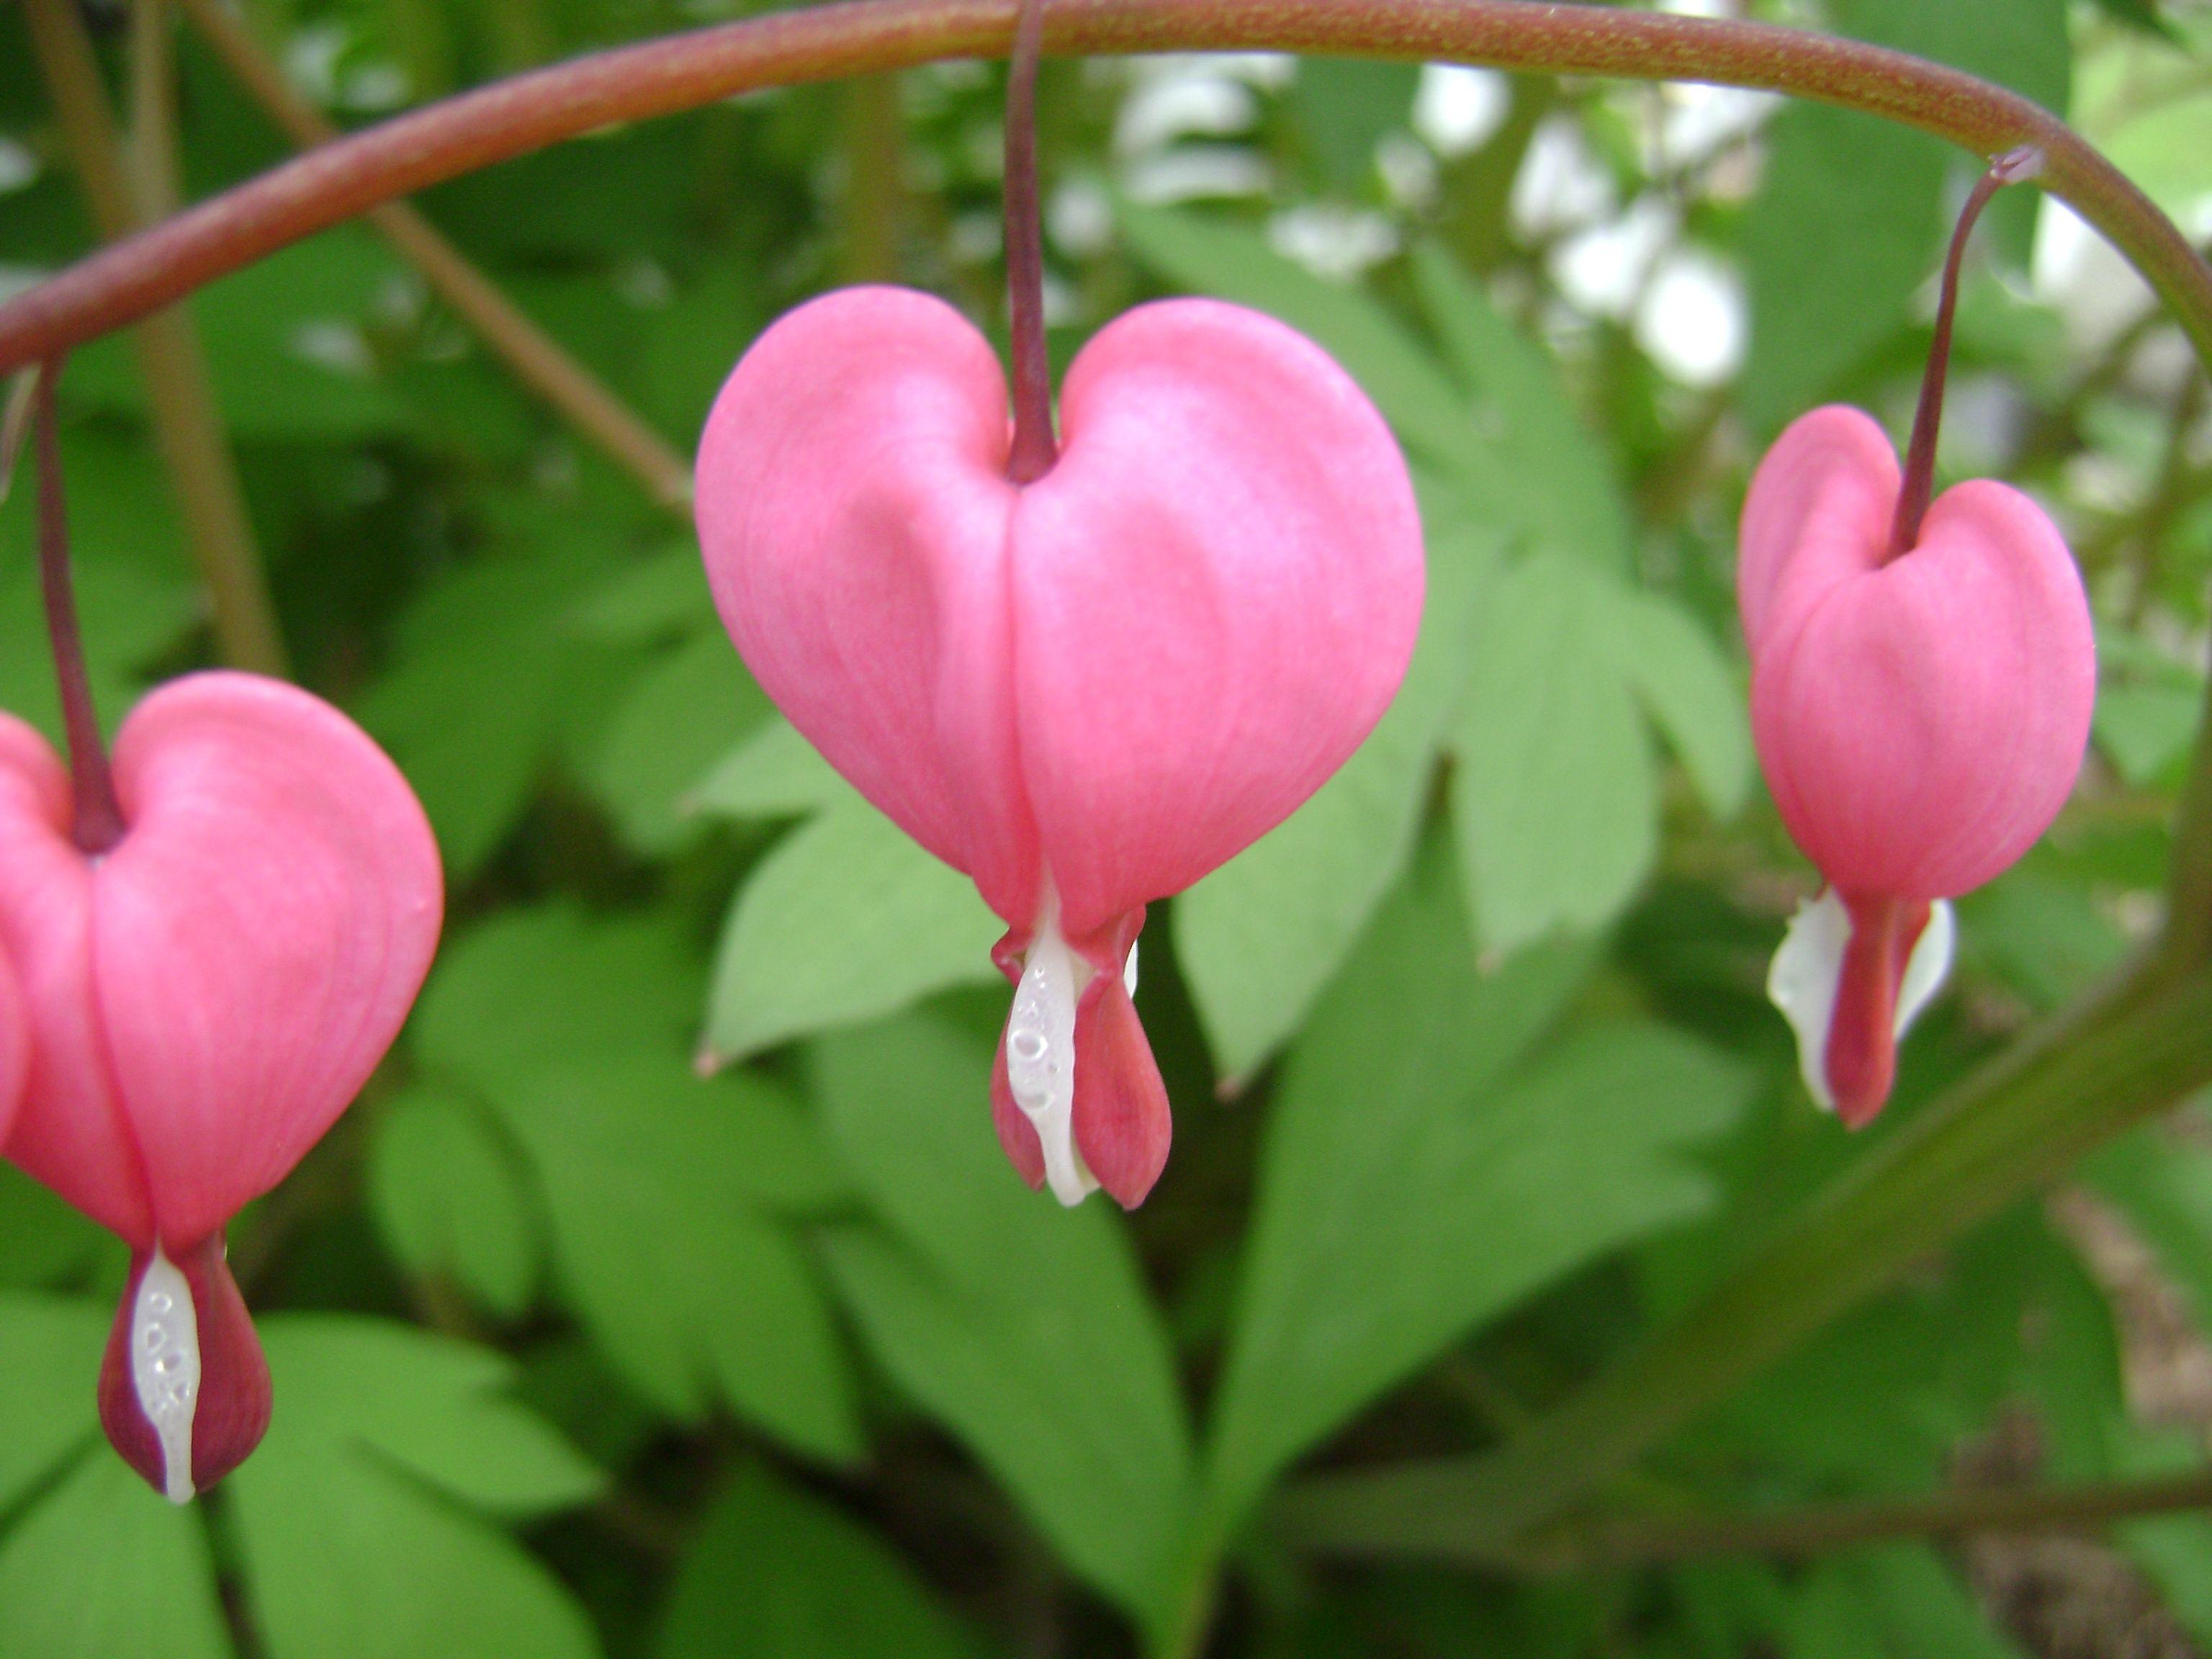 love heart shaped flowerflower - photo #22